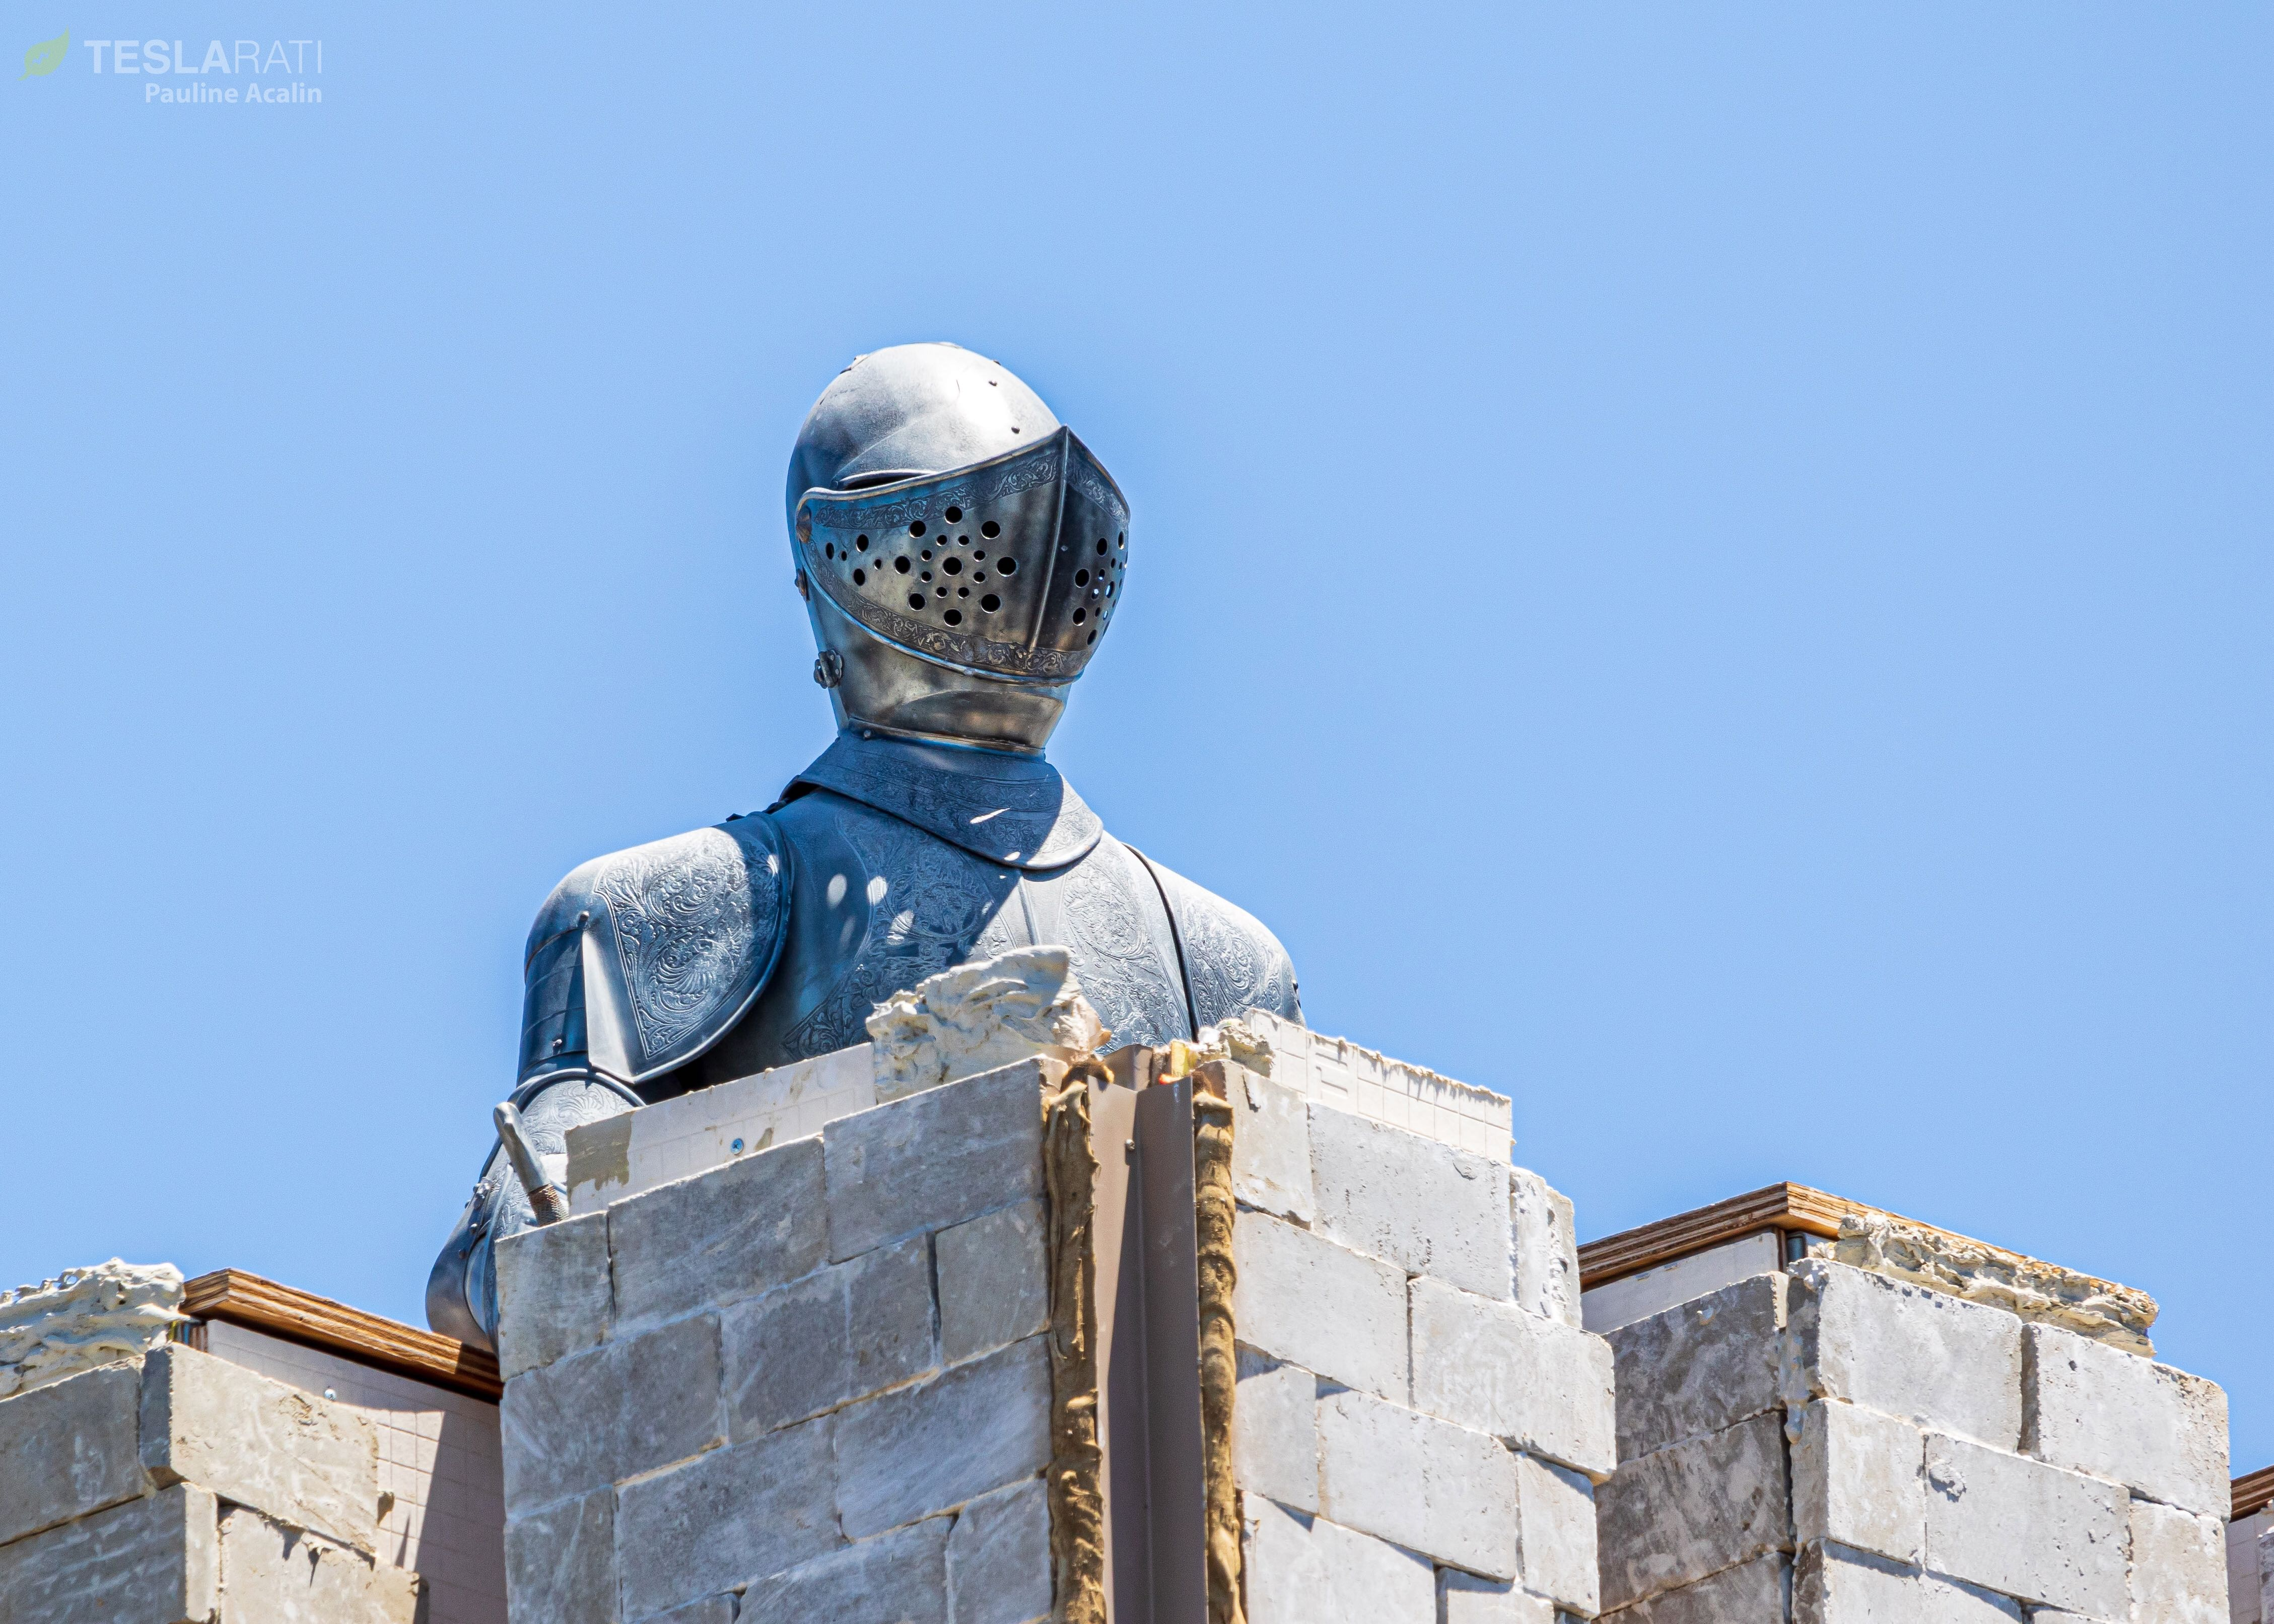 TBM-tower-knight-Pauline-Acalin-0519-5